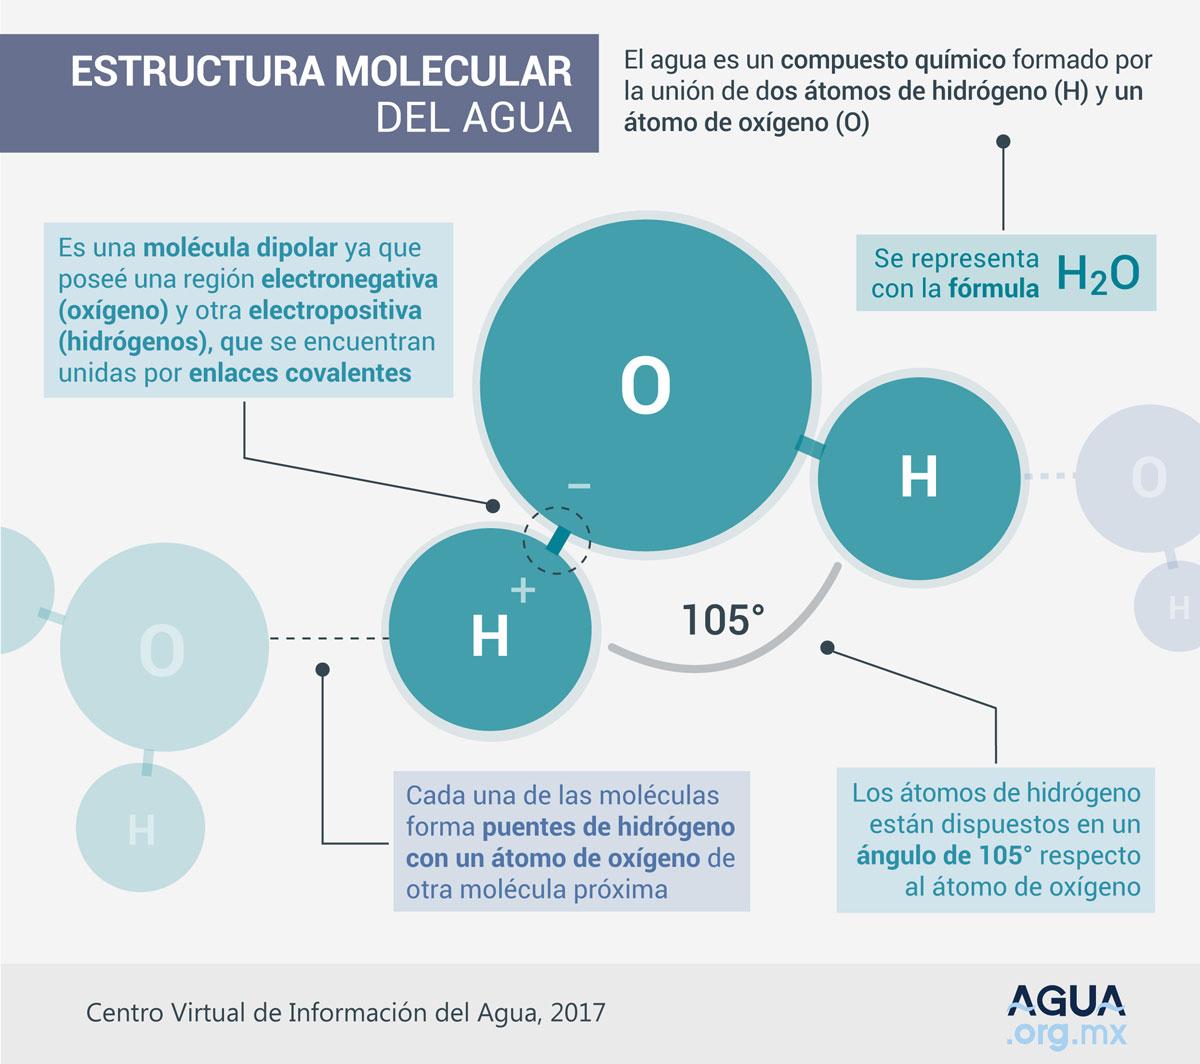 Que-es-Estructura-molecular-del-agua.jpg